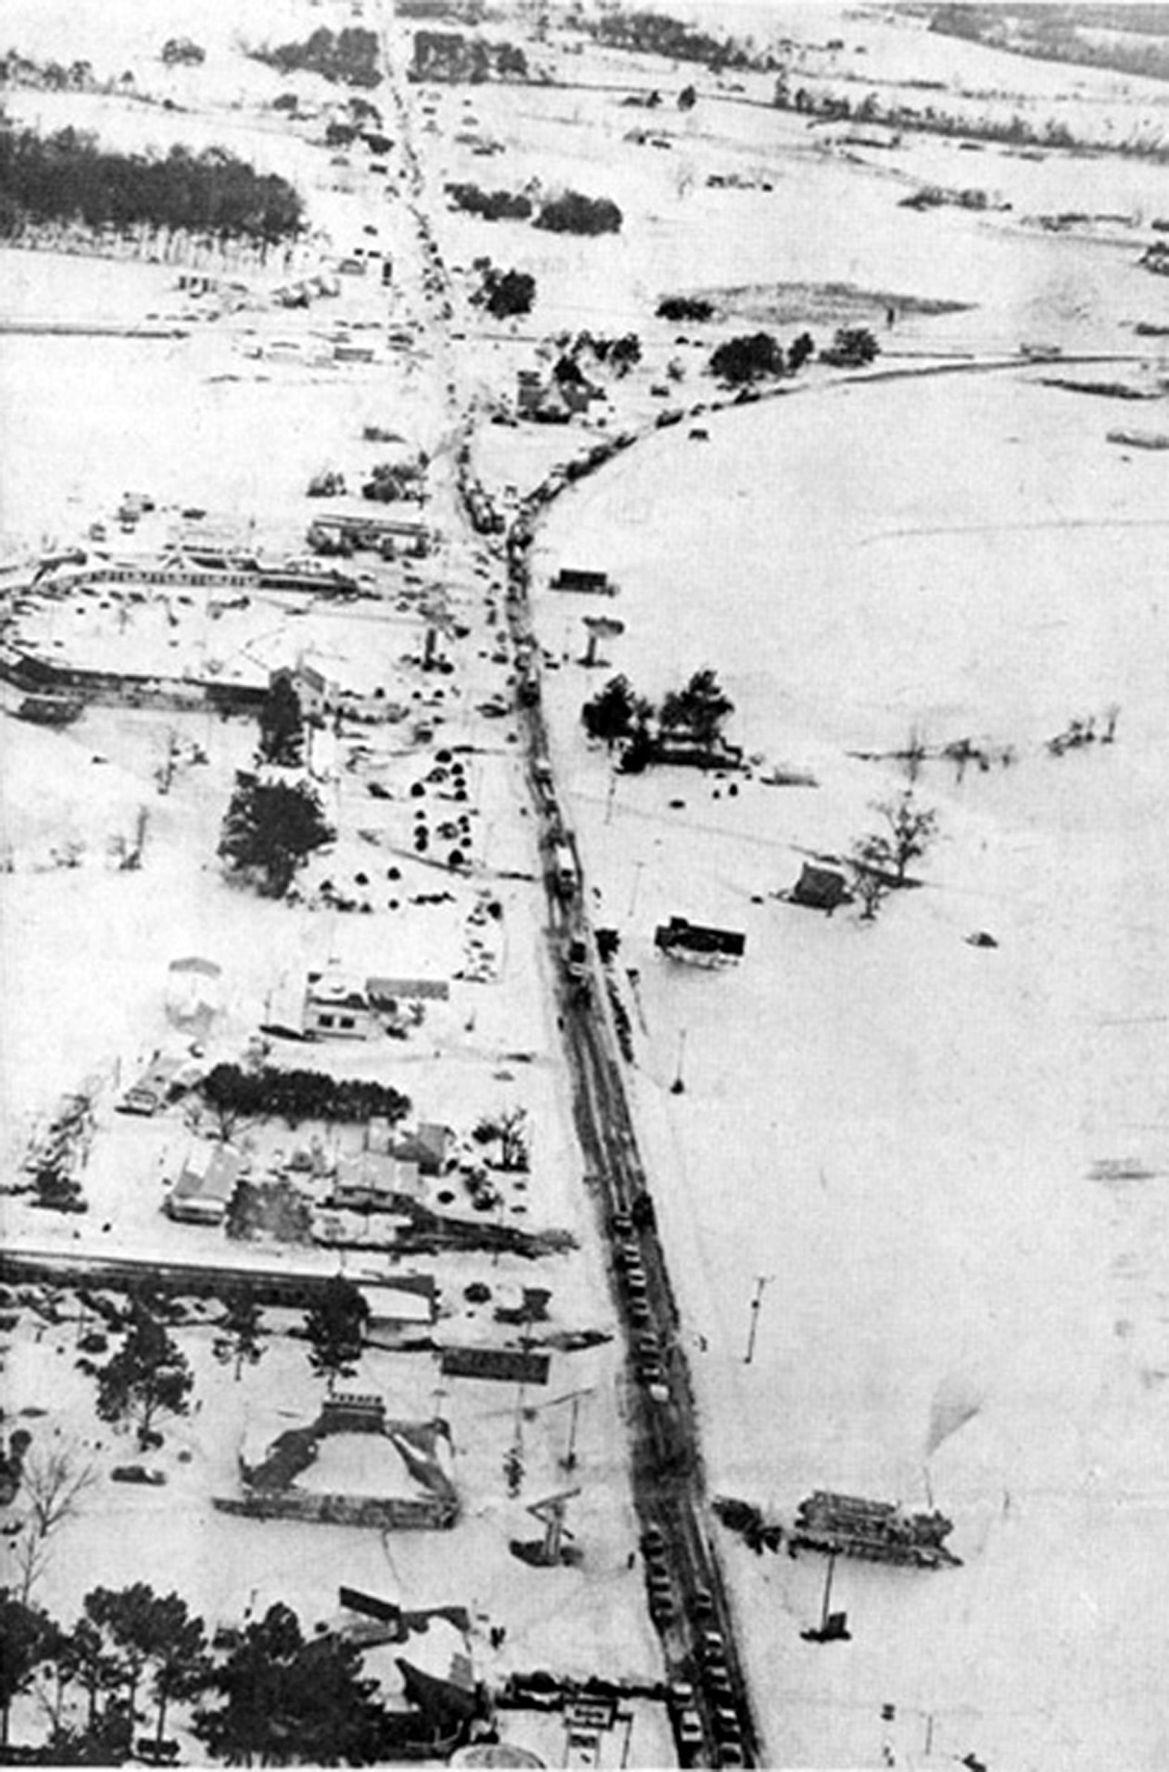 1973 snowfall in Santee